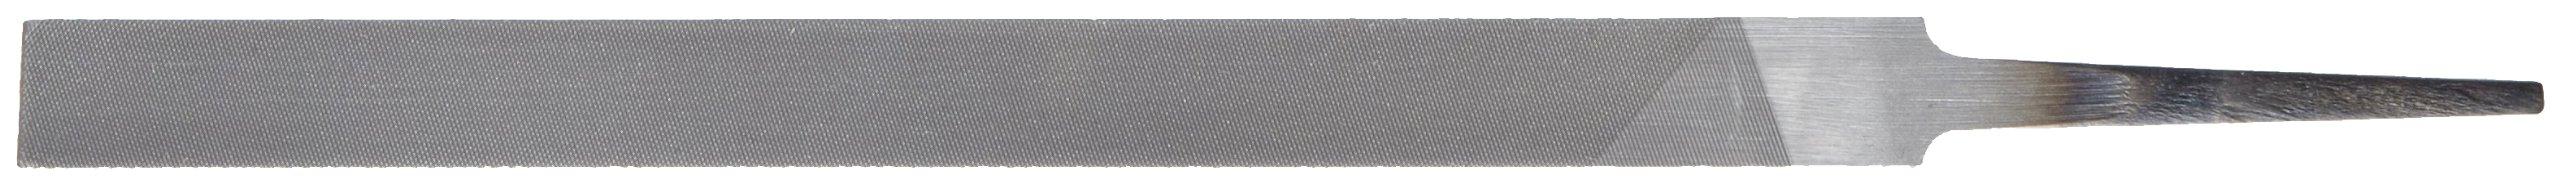 Nicholson Pillar File, Swiss Pattern, Double Cut, Rectangular, #1 Coarseness, 6'' Length